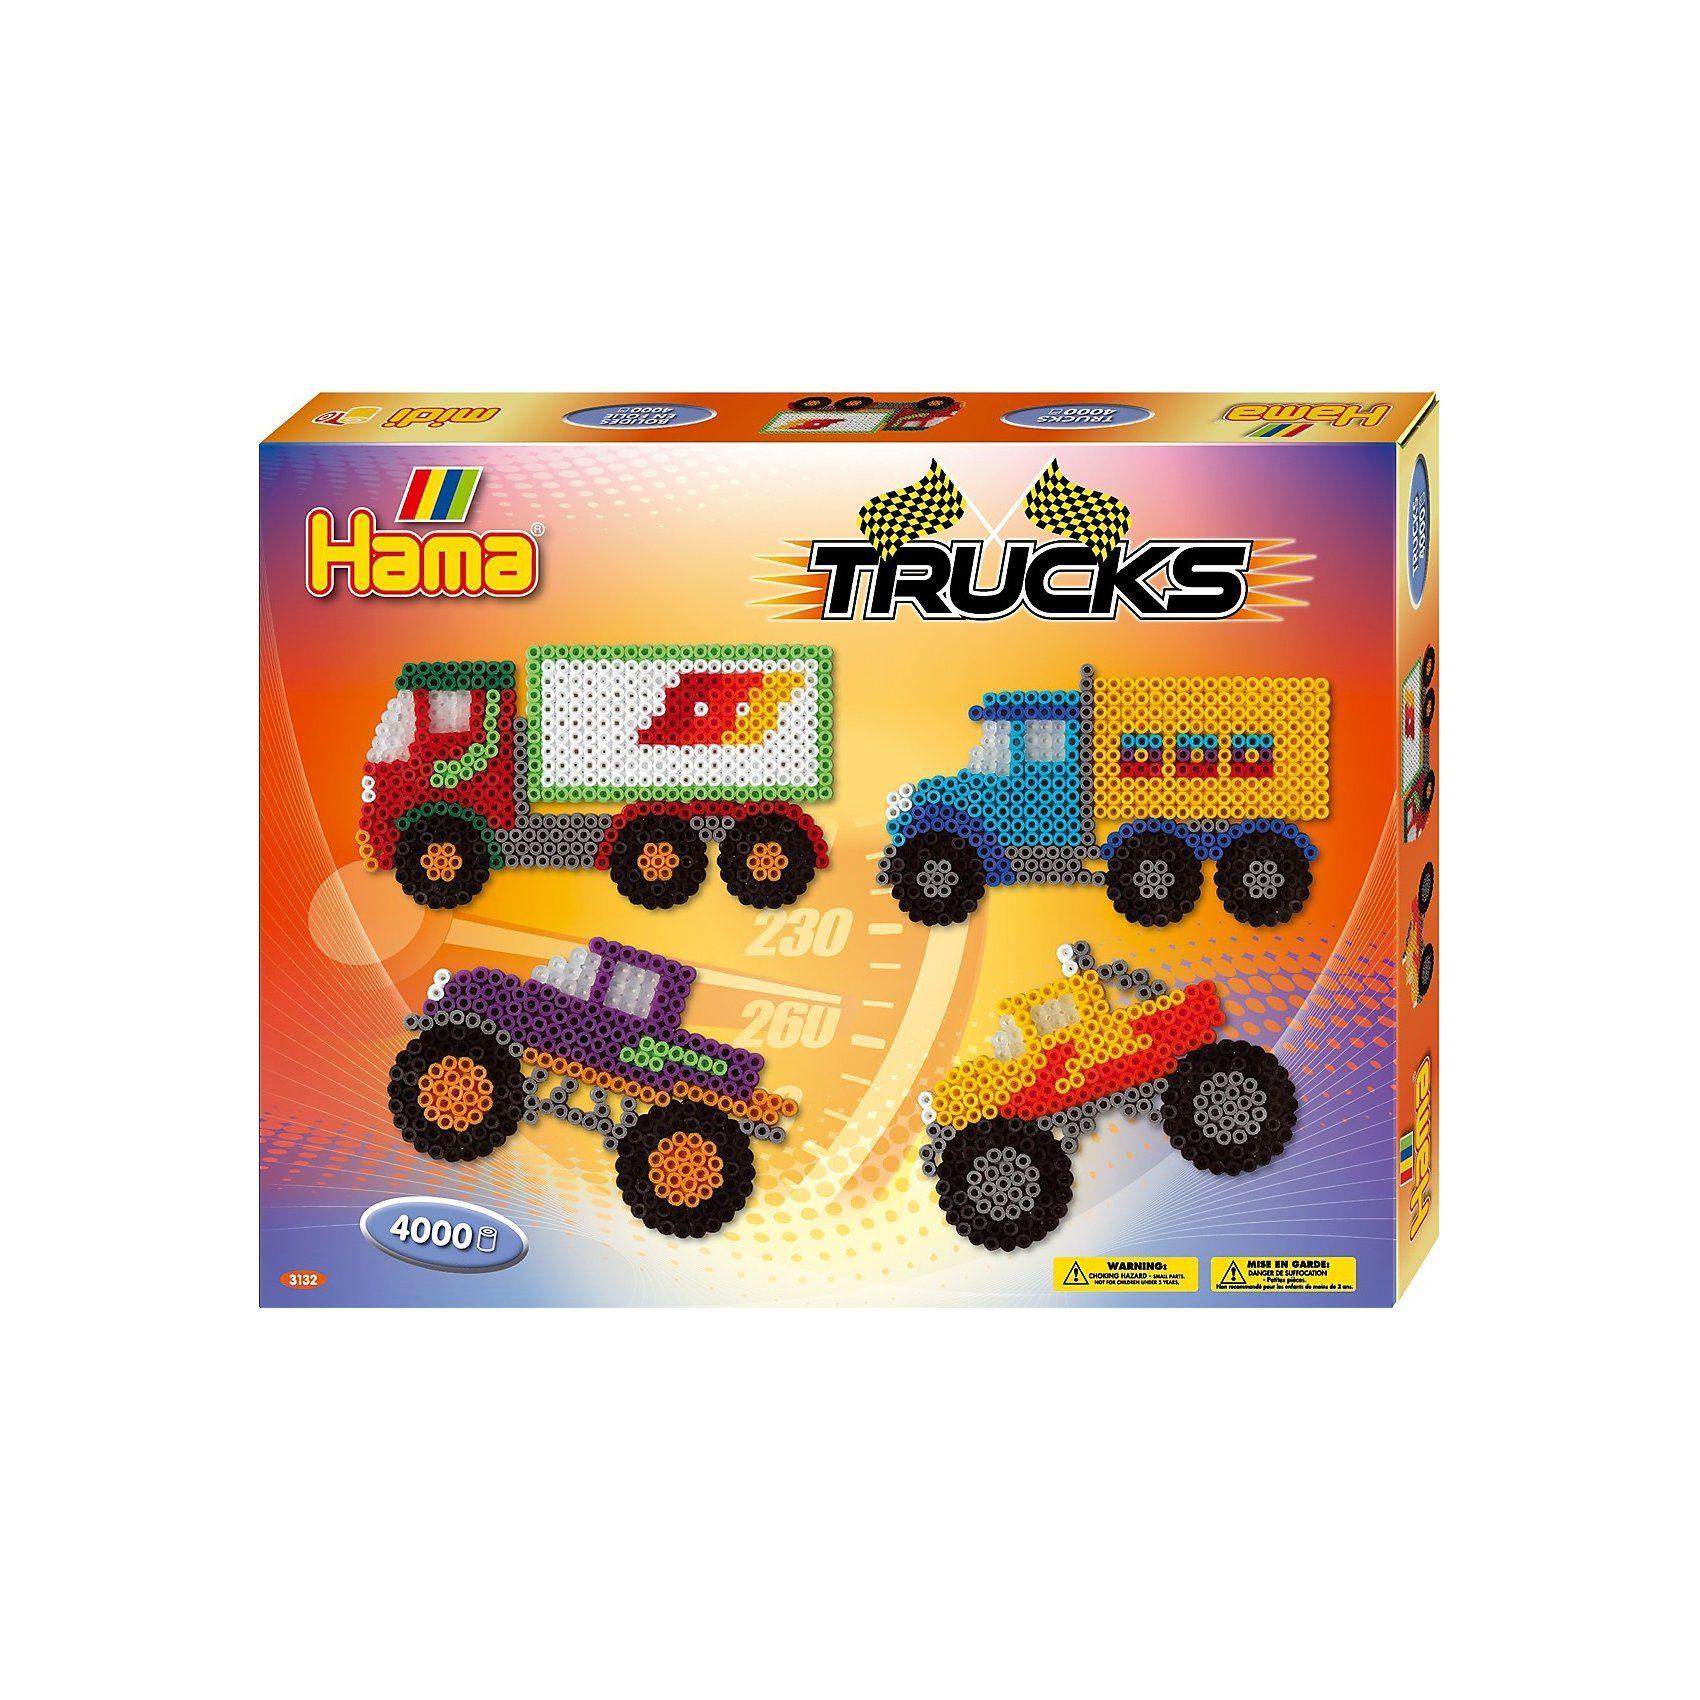 Hama Perlen HAMA 3132 Geschenkset Trucks, 4.000 midi-Perlen & Zubehör